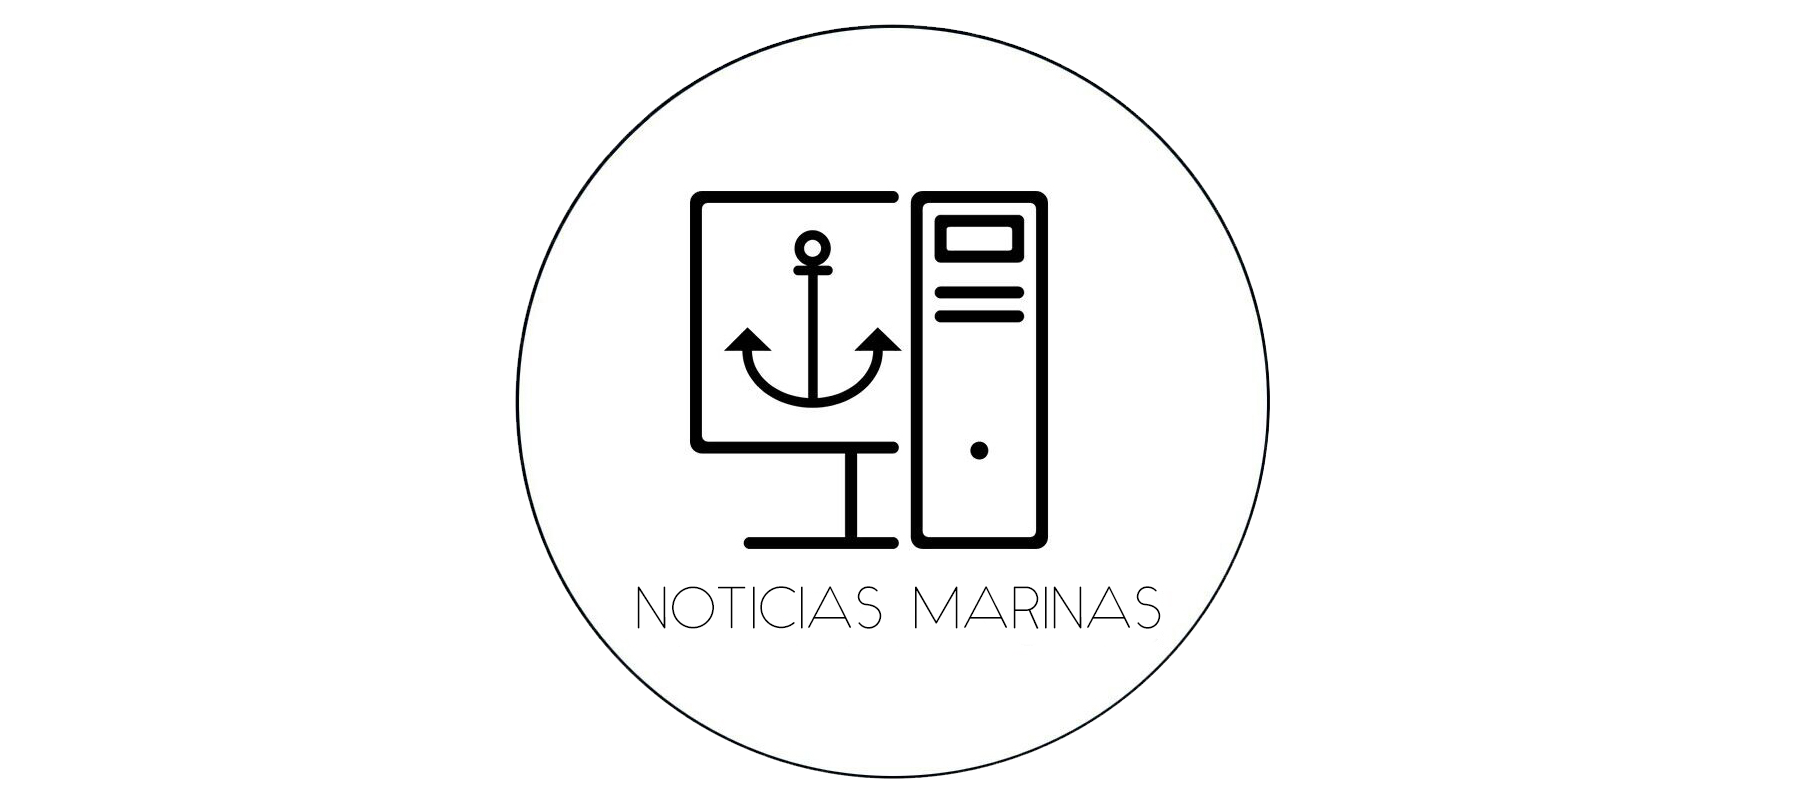 Noticias Marinas